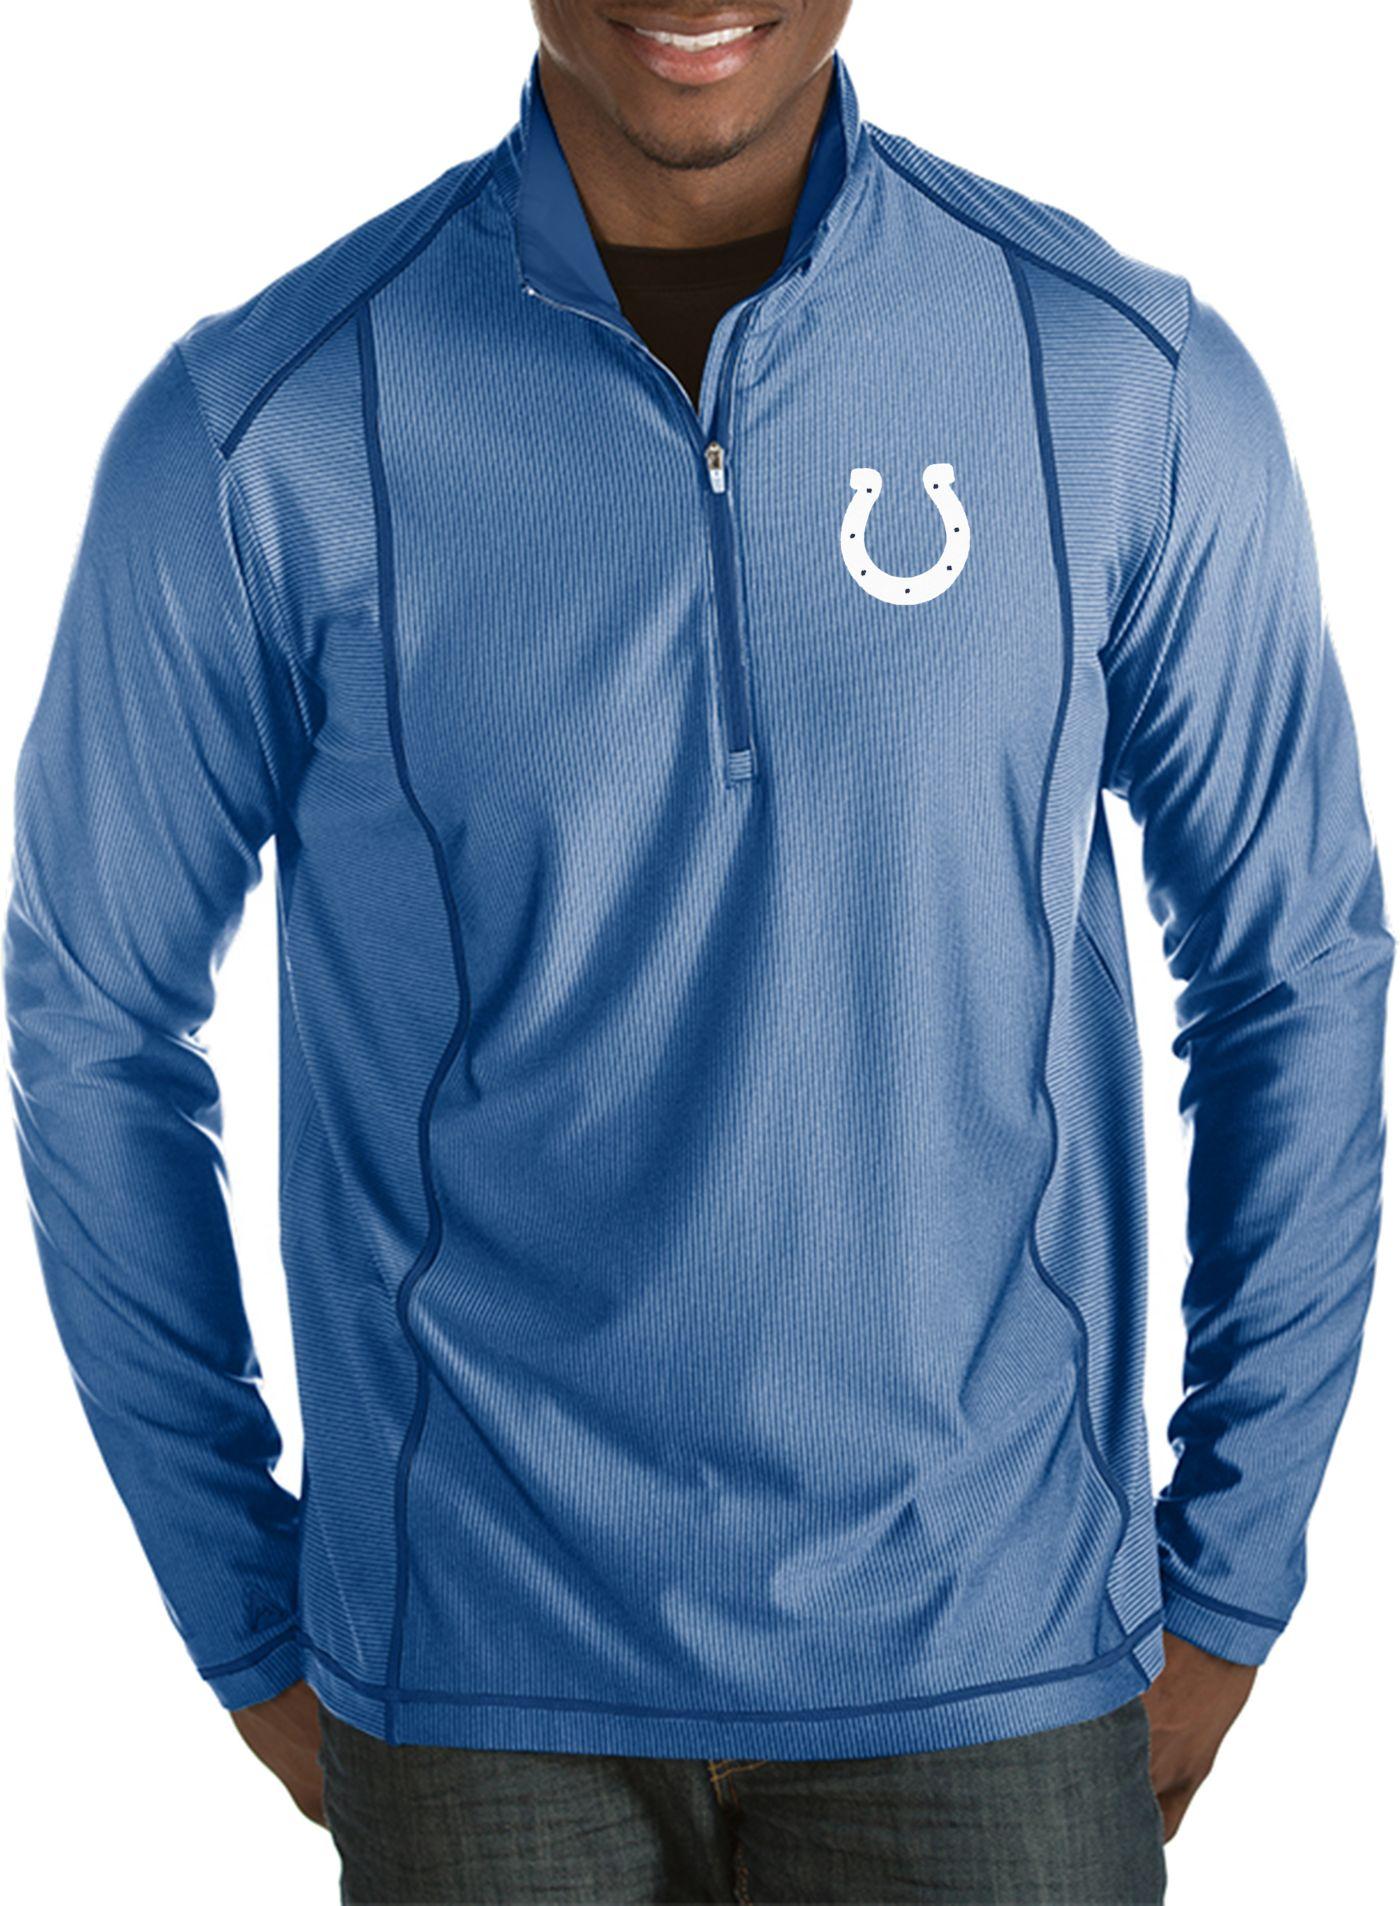 Antigua Men's Indianapolis Colts Tempo Royal Quarter-Zip Pullover